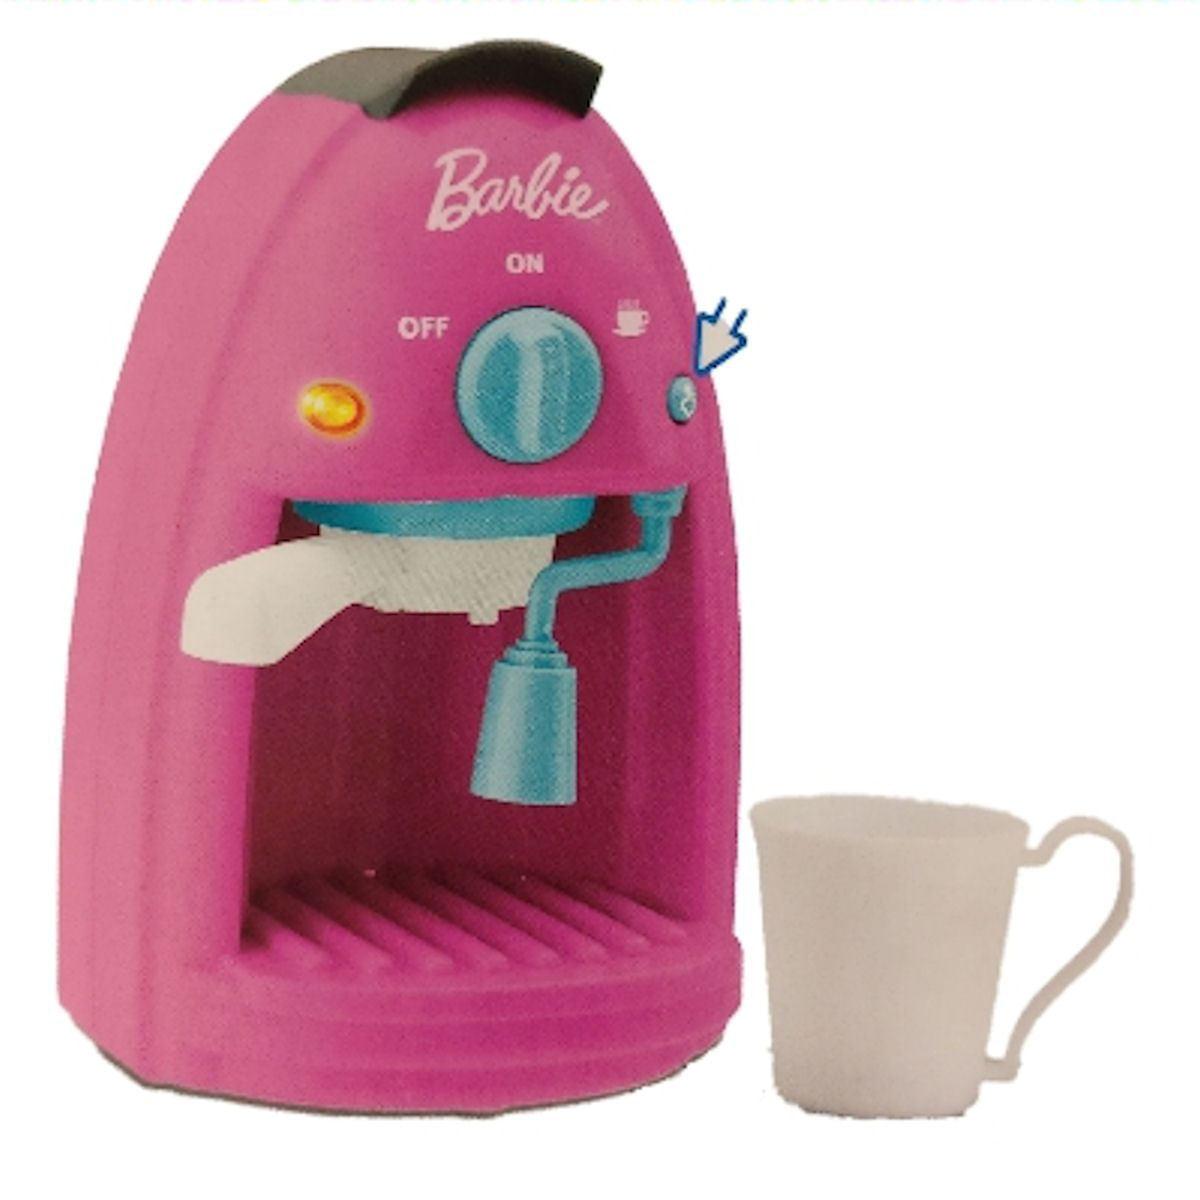 Barbie Kitchen Playset Coffee Espresso Maker - Walmart.com